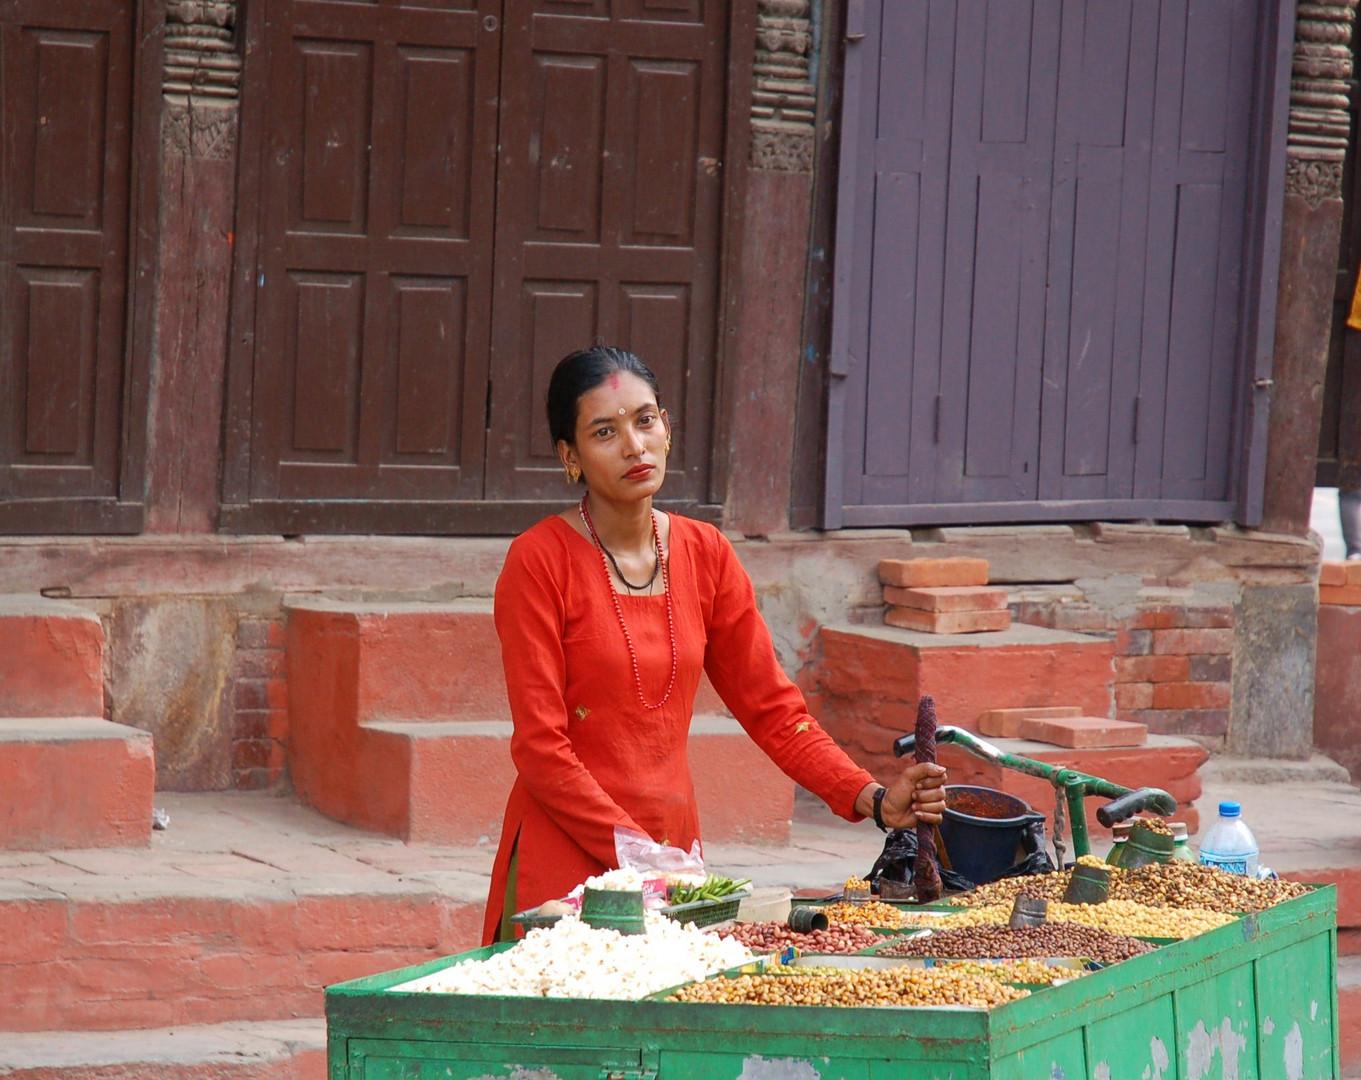 Marktfrau in Kathmandu